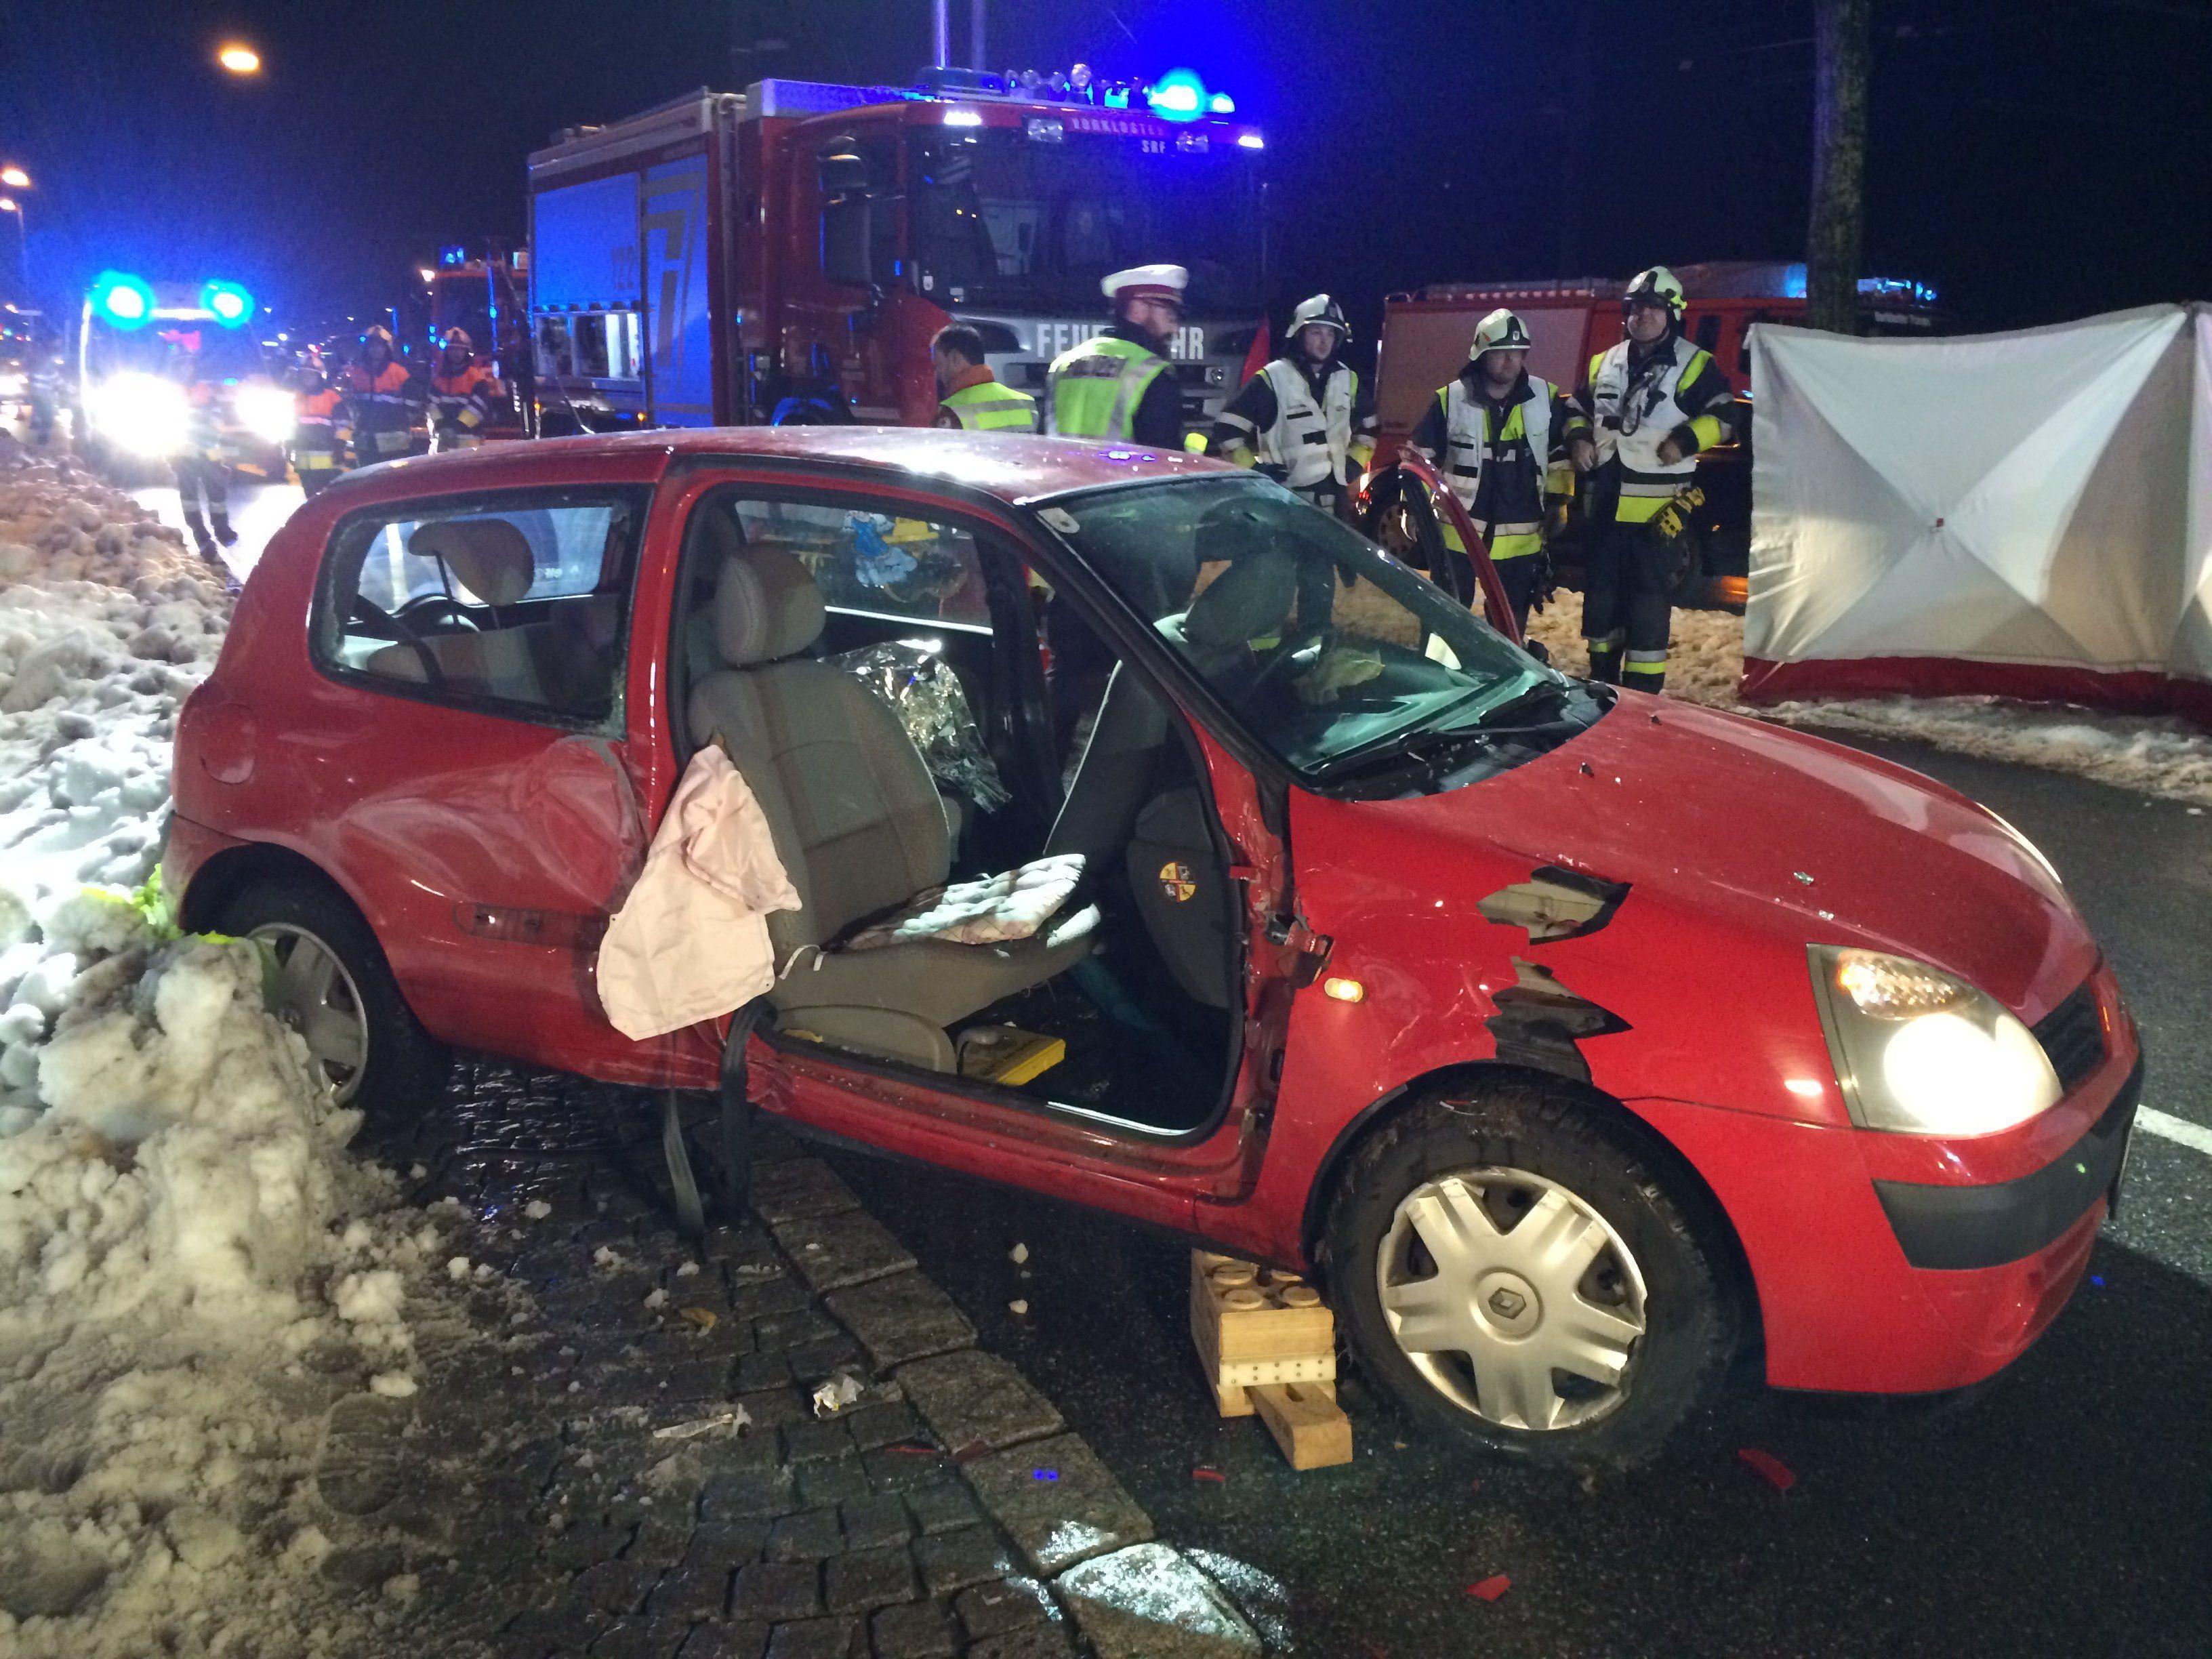 Verkehrsunfall in Bregenzer Innenstadt fordert Verletzte.